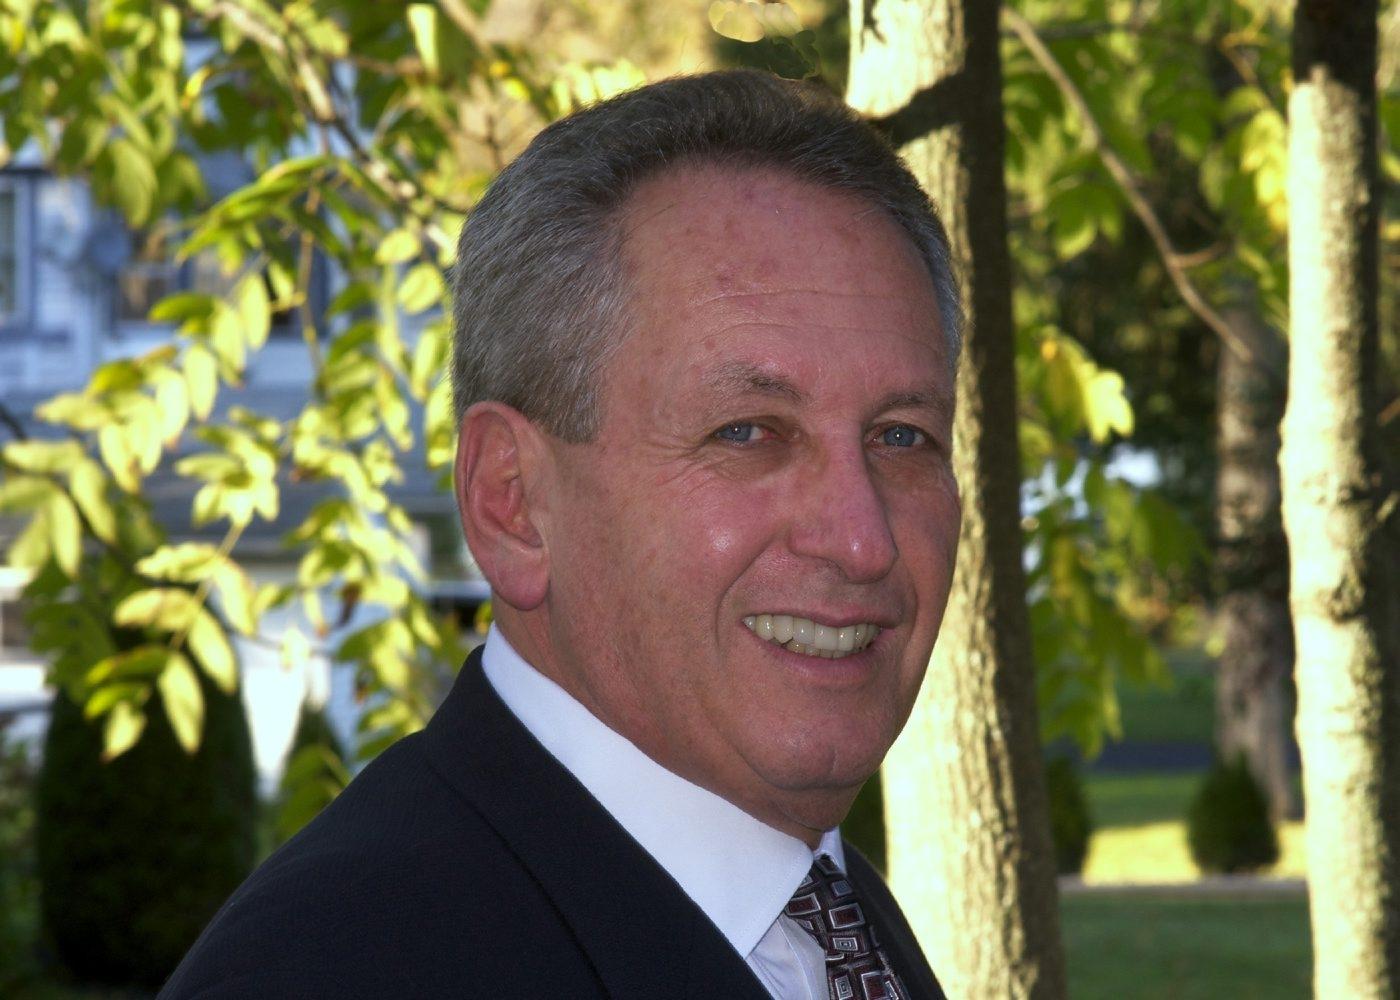 Lancaster Highway Superintendent candidate, Dan Amatura